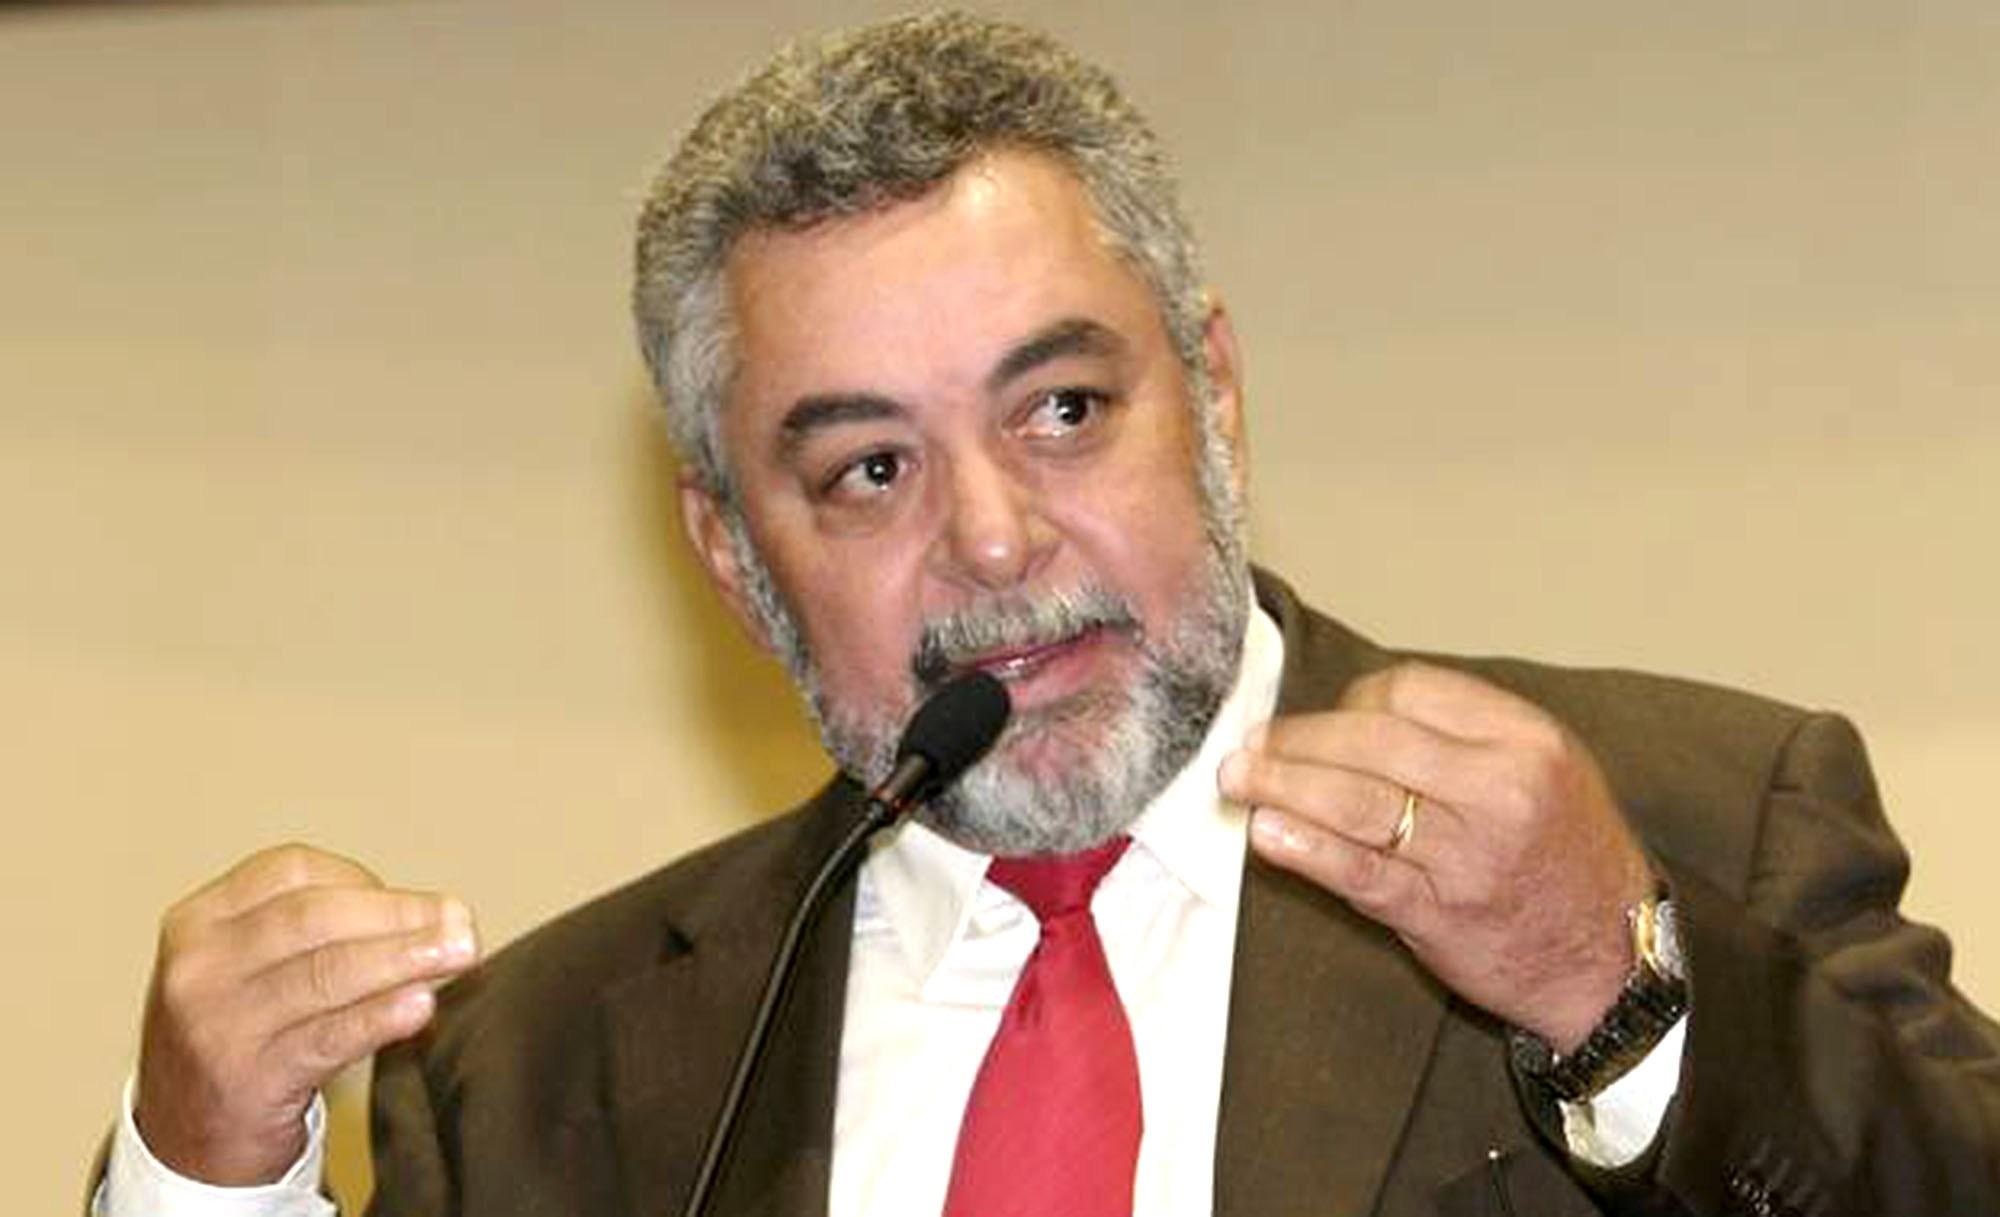 PPS corteja Marrafon, mas Muniz alerta que 'apoio a Taques depende de debates'